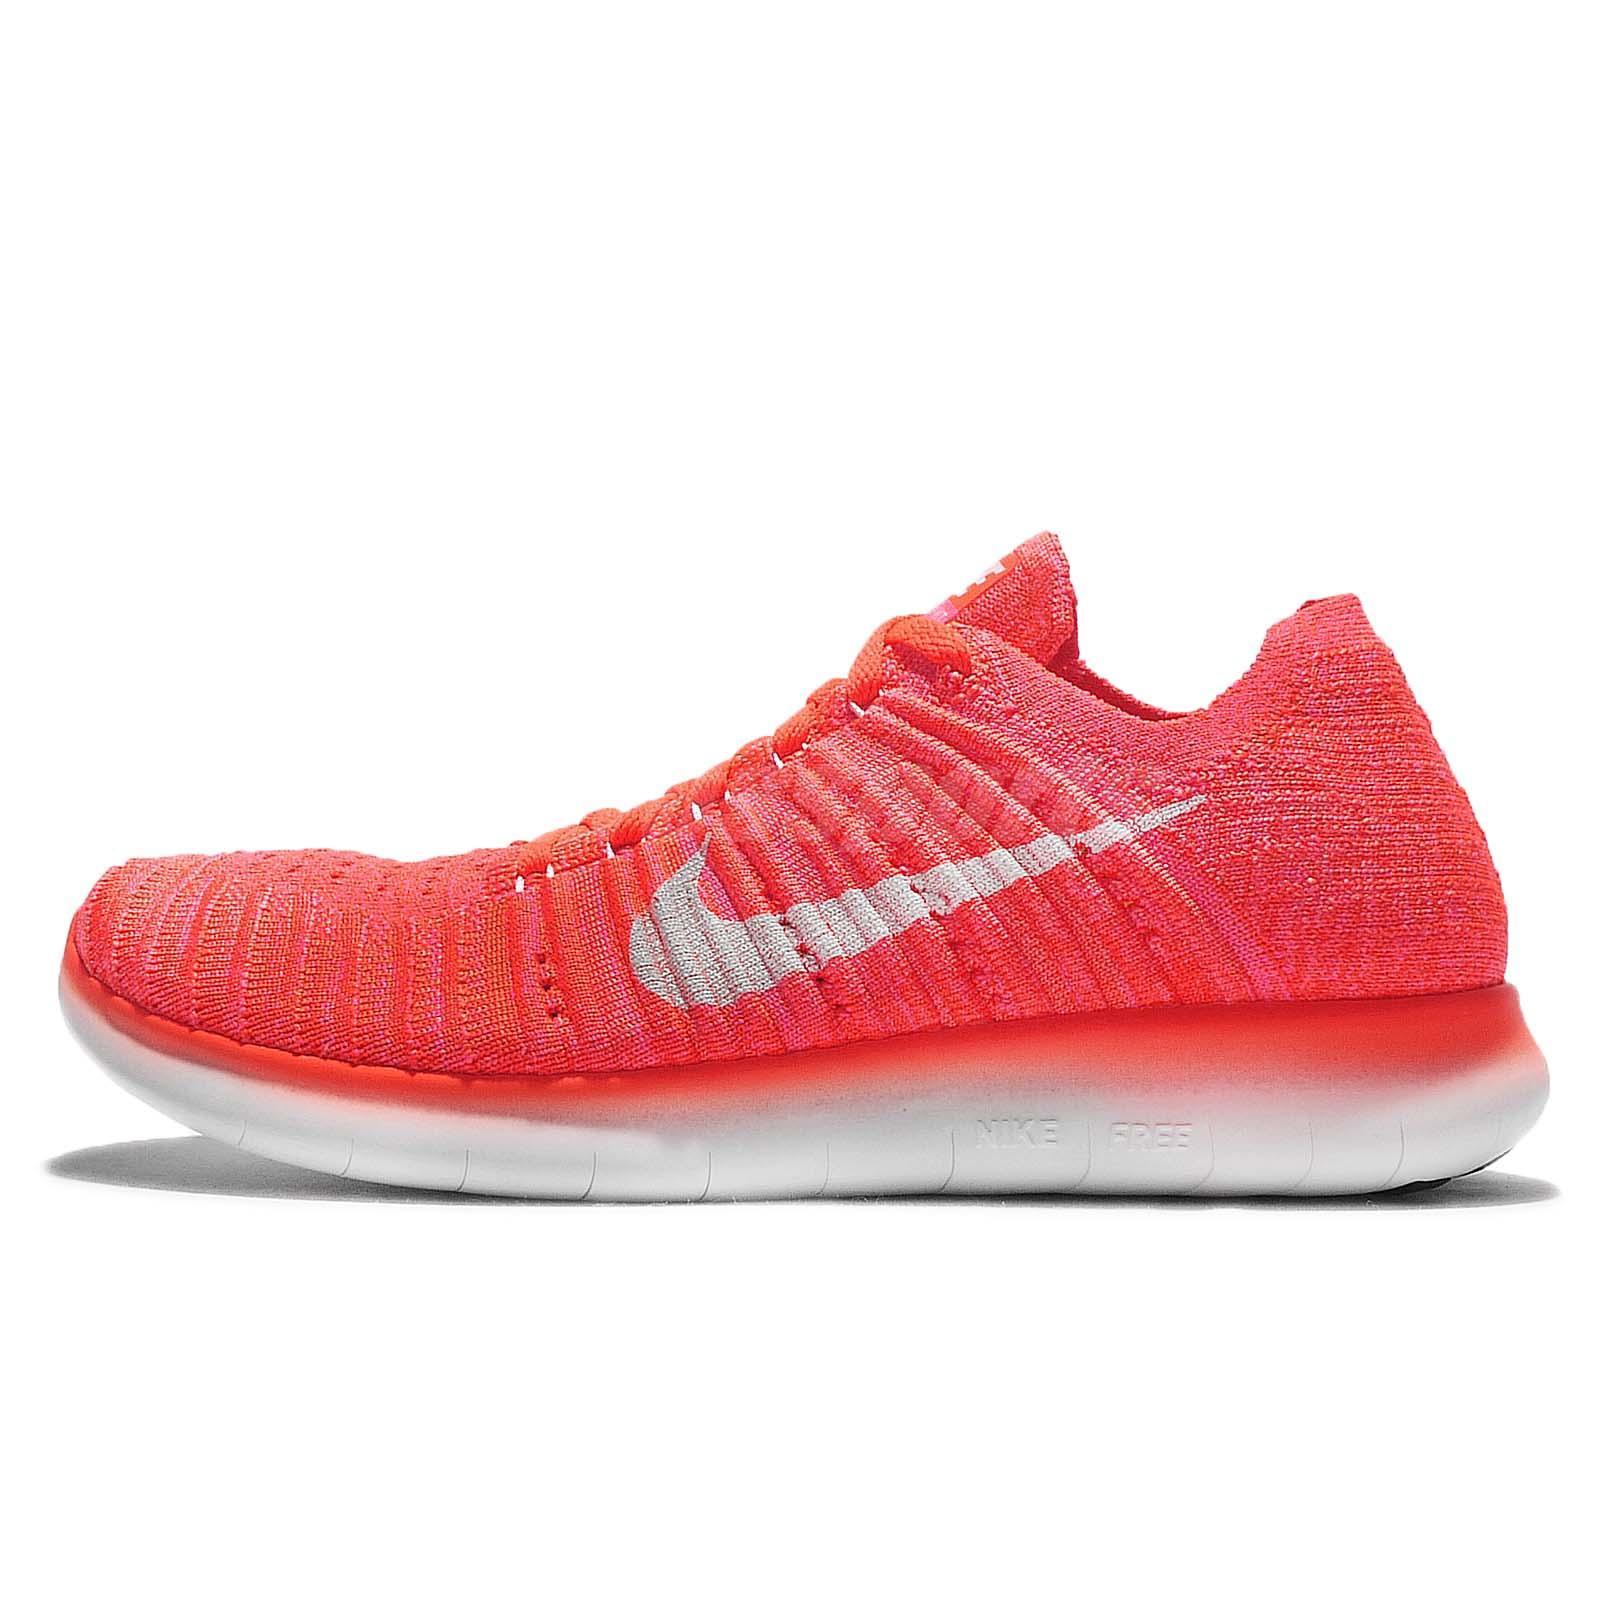 Tennis Nike Free Run + 3 Feminino Acheter Des Actions